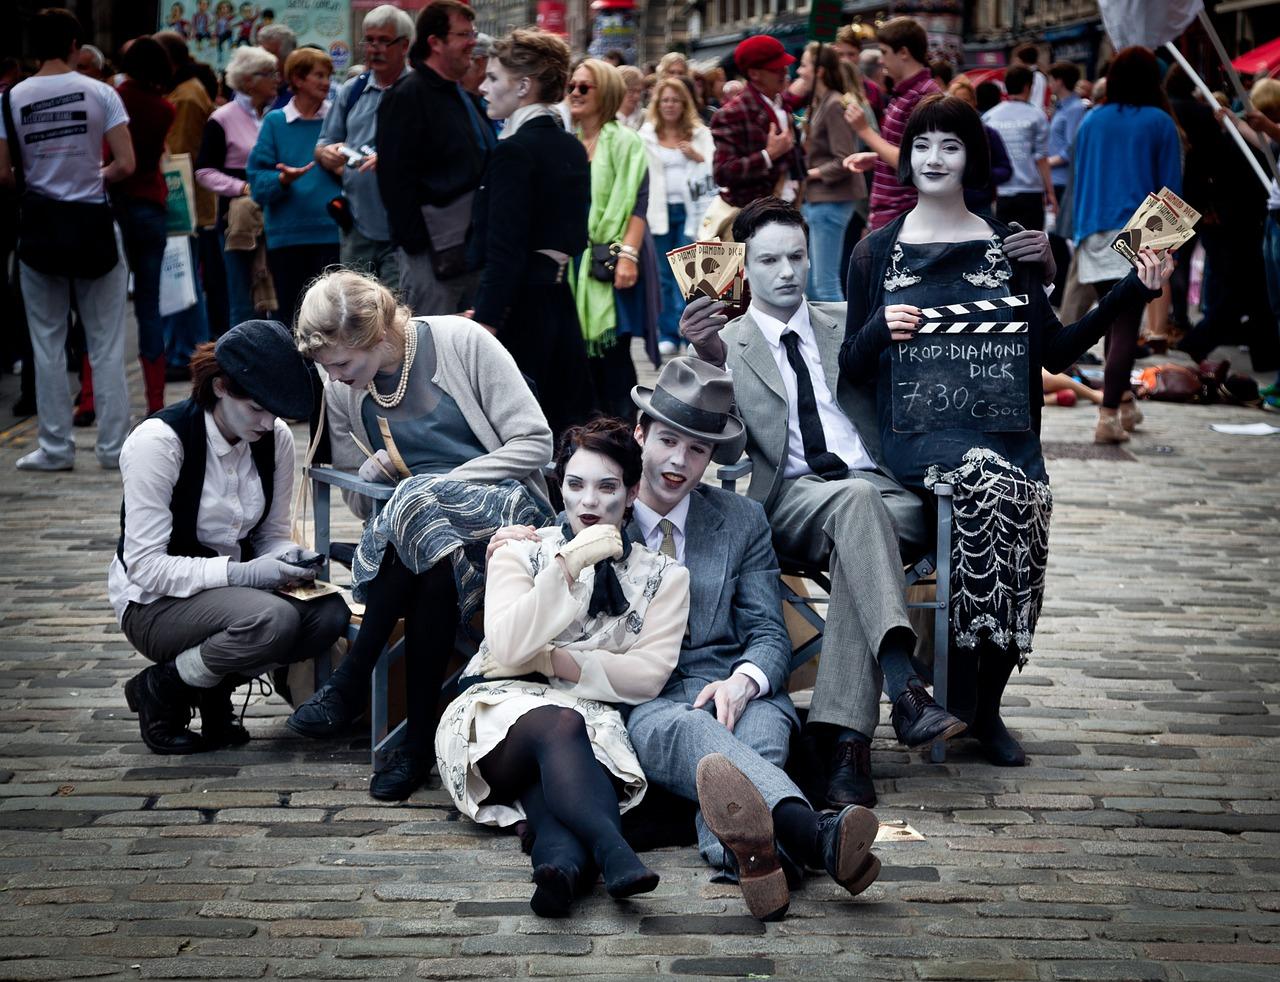 Edinburgh Fringe, street performers